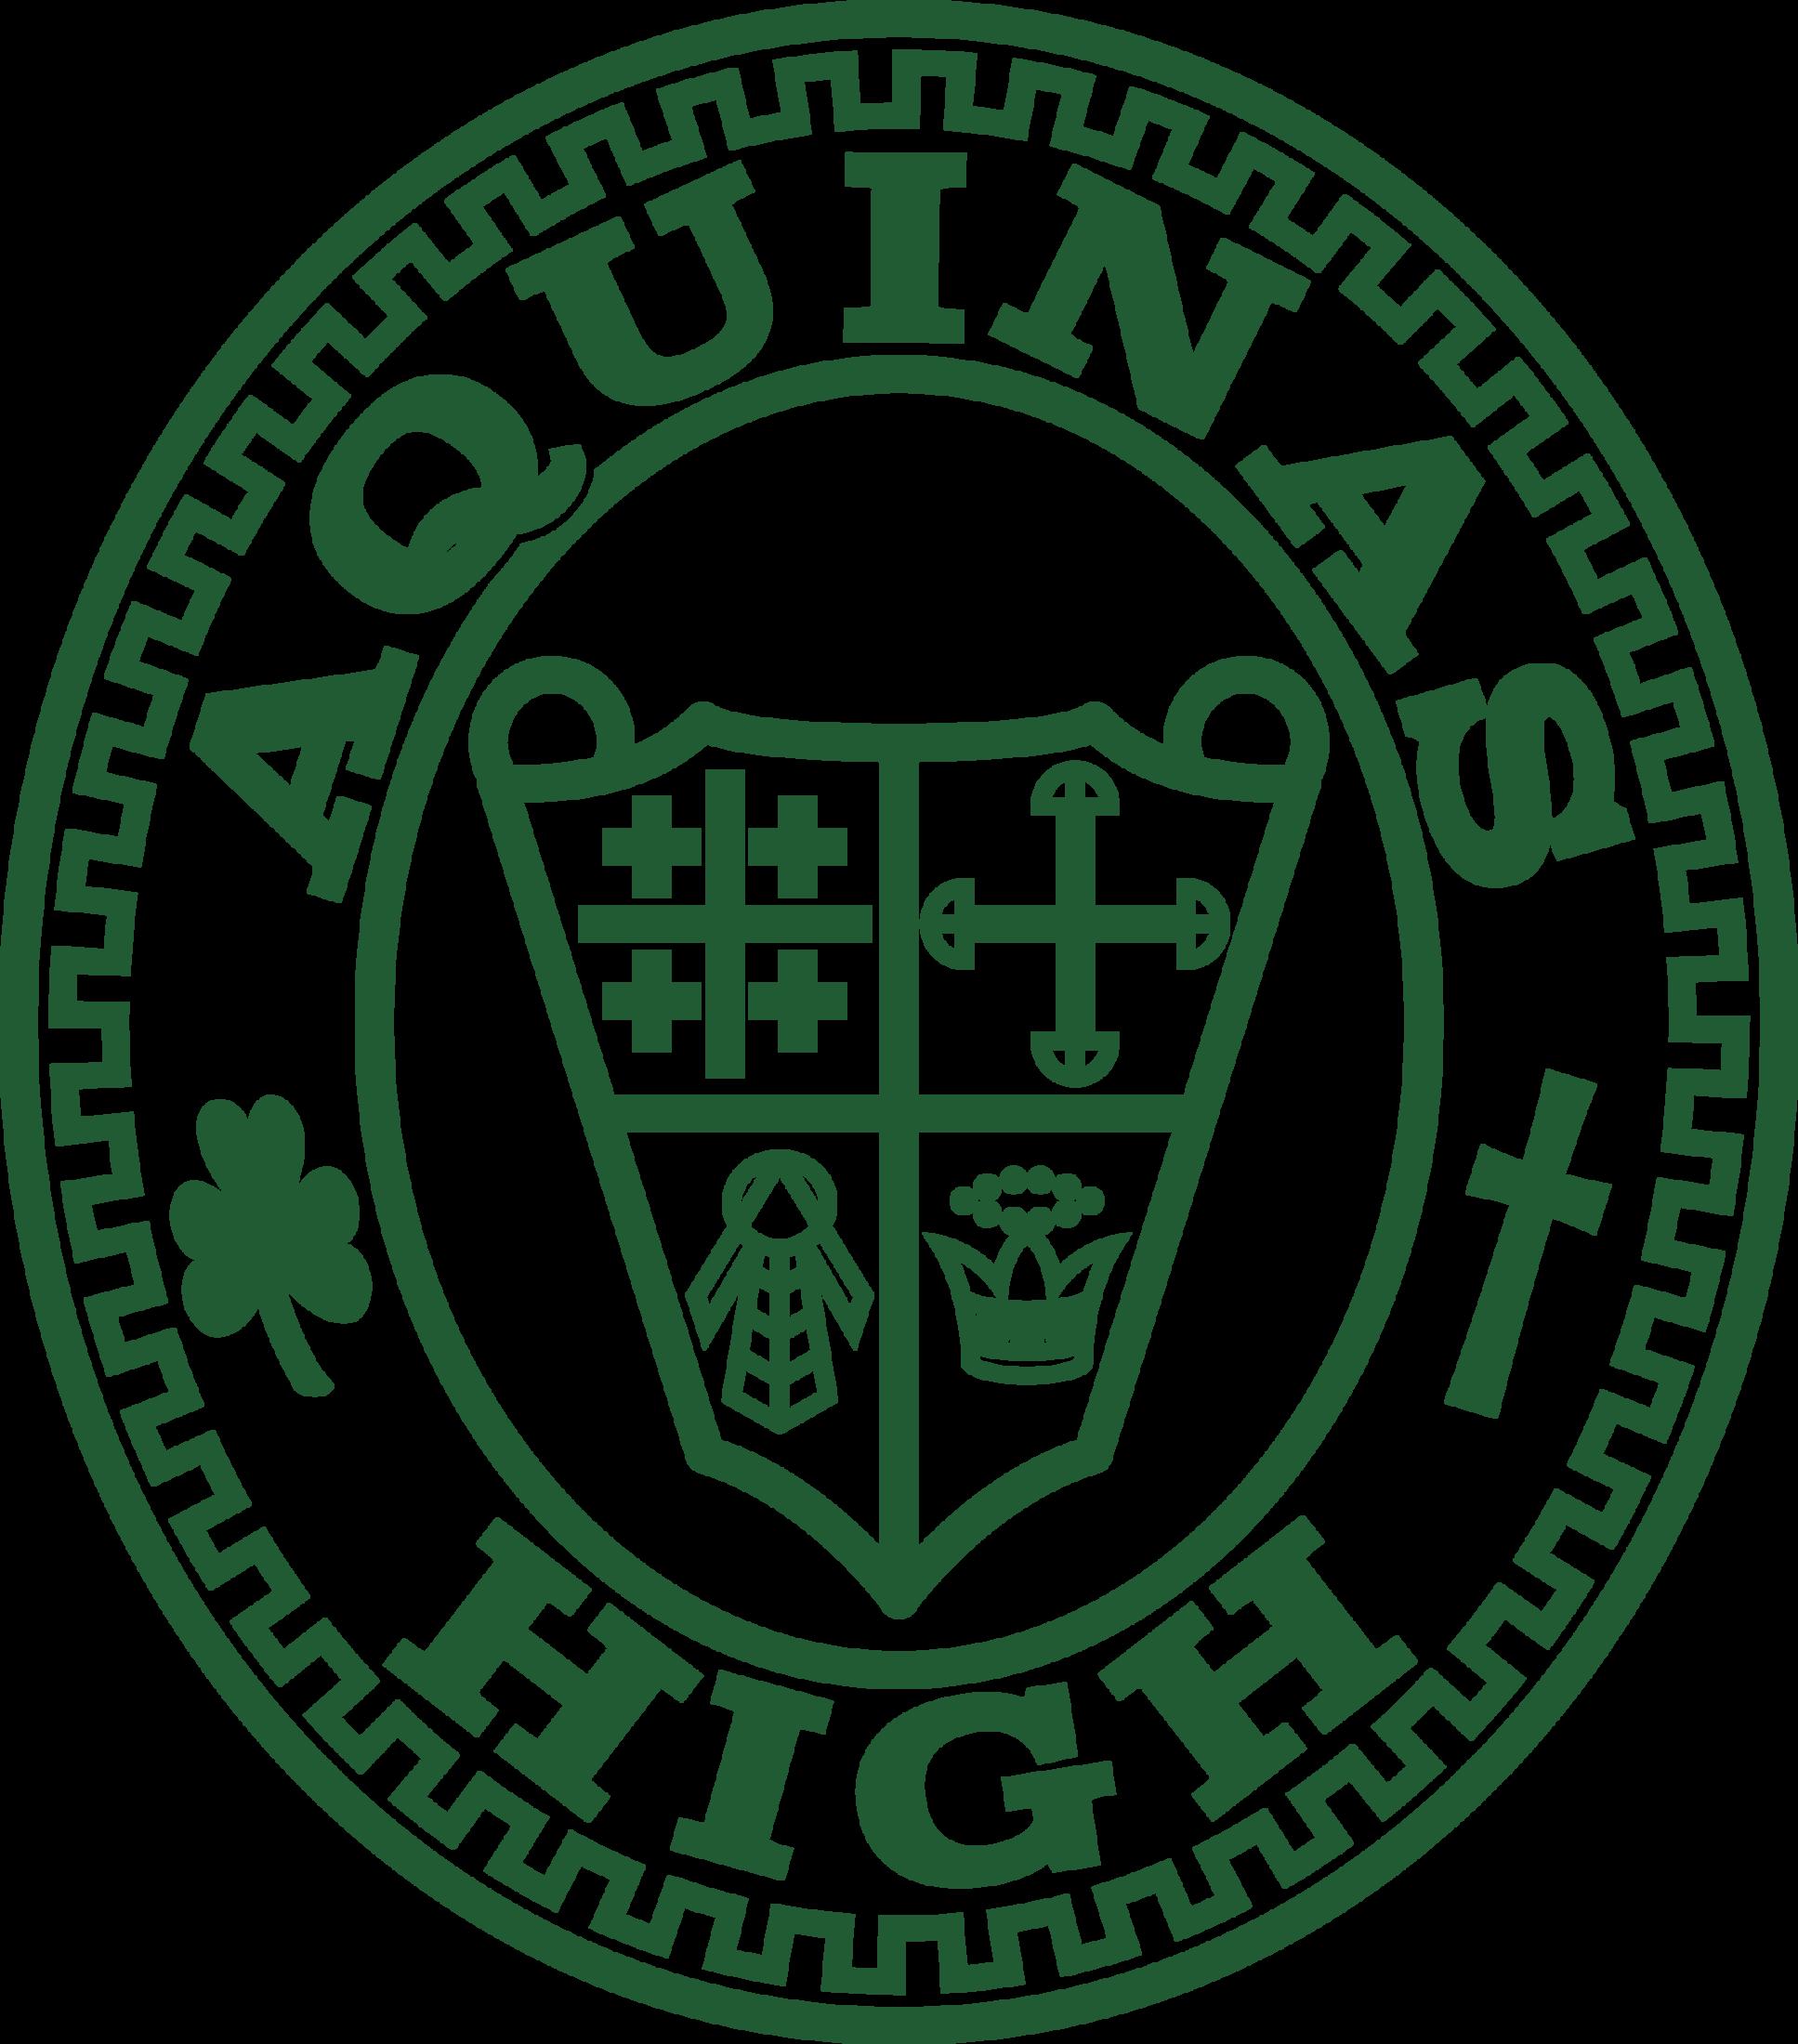 Aquinas High School Seal